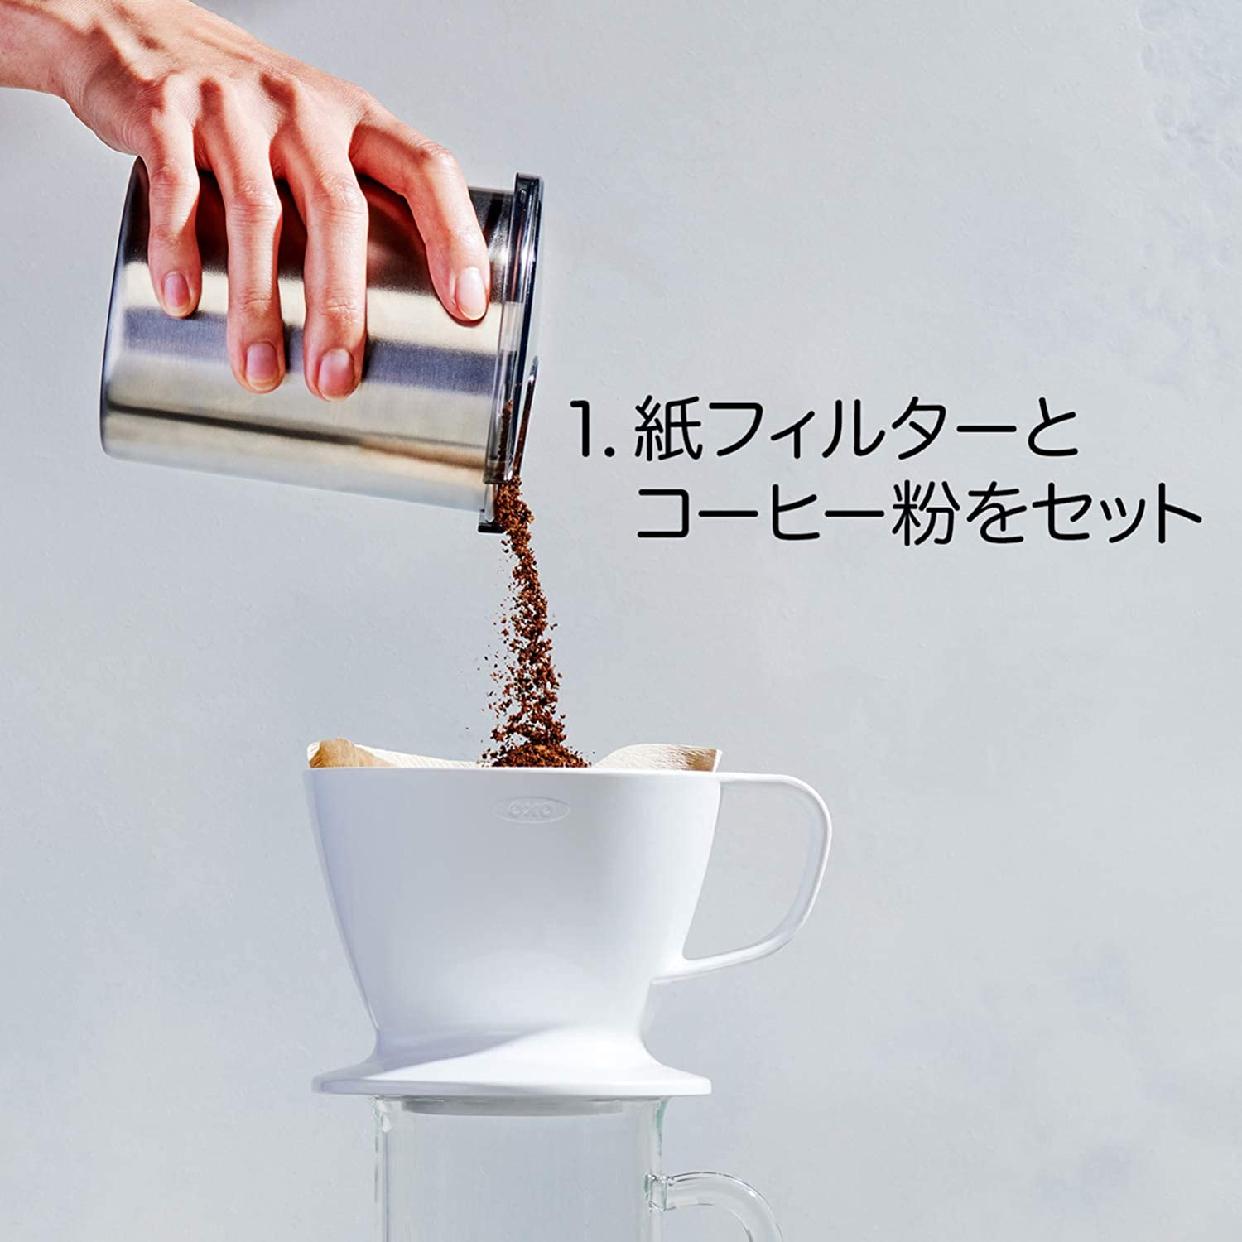 OXO(オクソー) オートドリップコーヒーメーカー 11180100の商品画像3